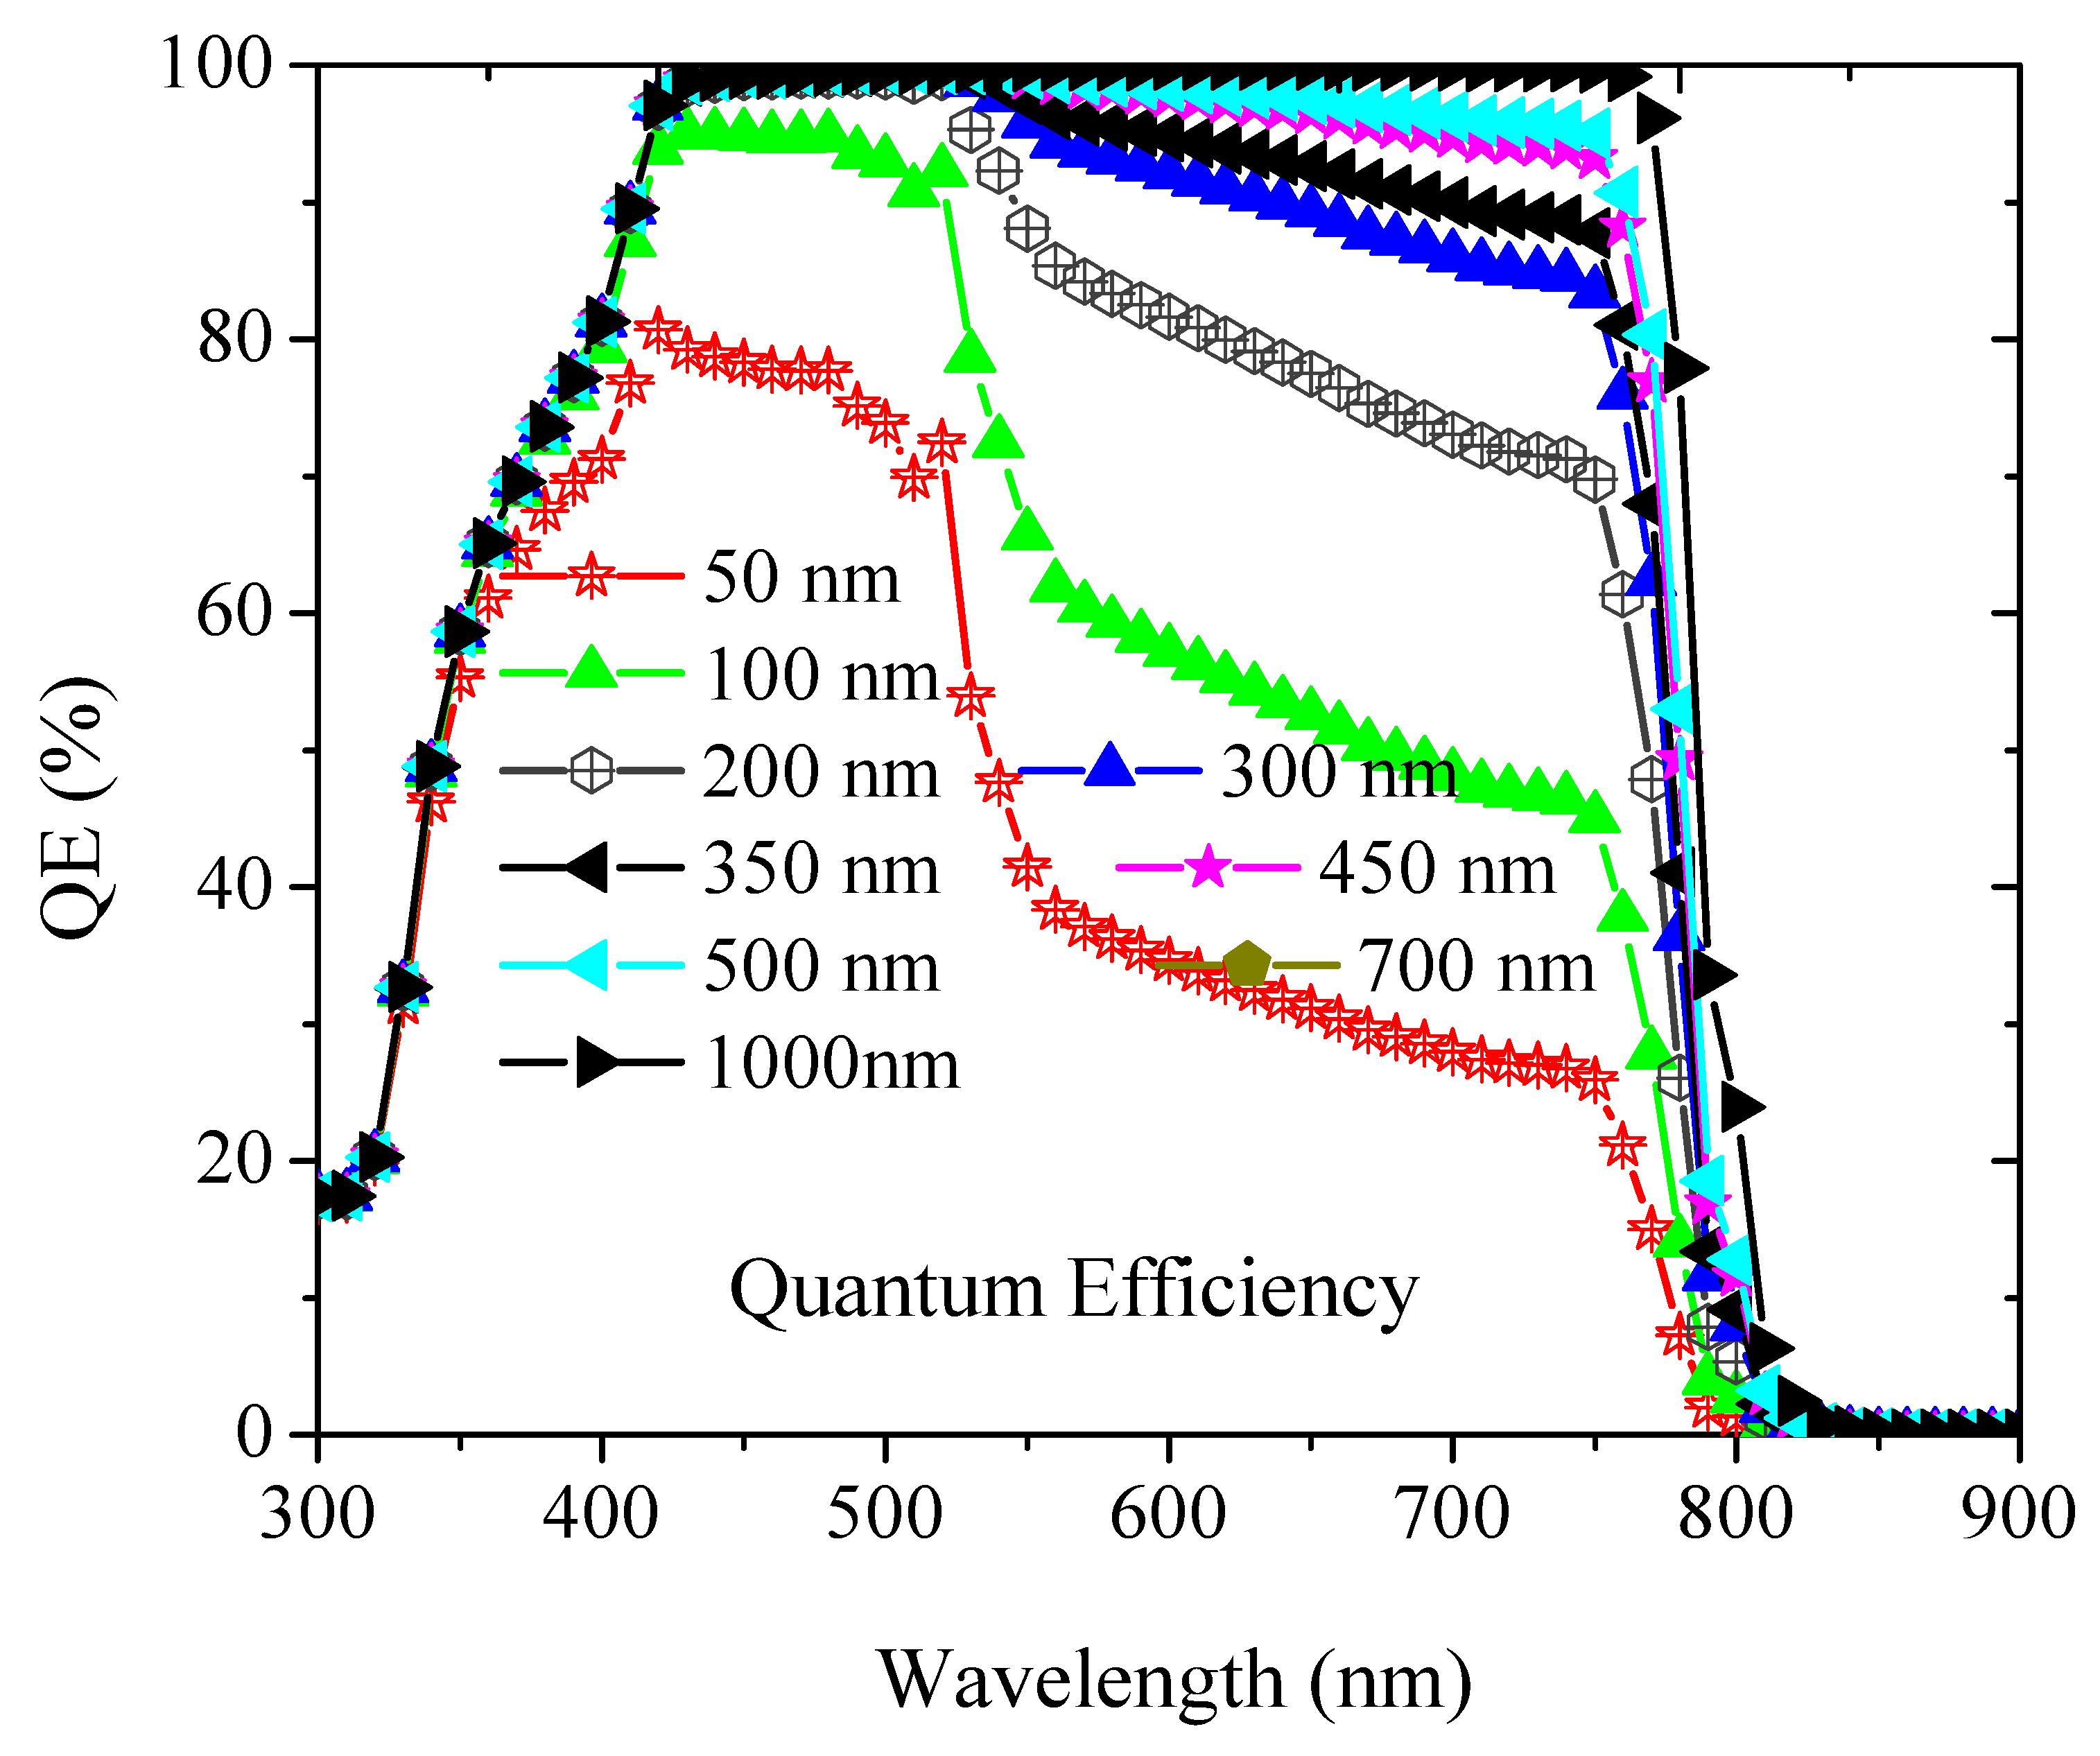 Numerical Simulations on Perovskite Photovoltaic Devices